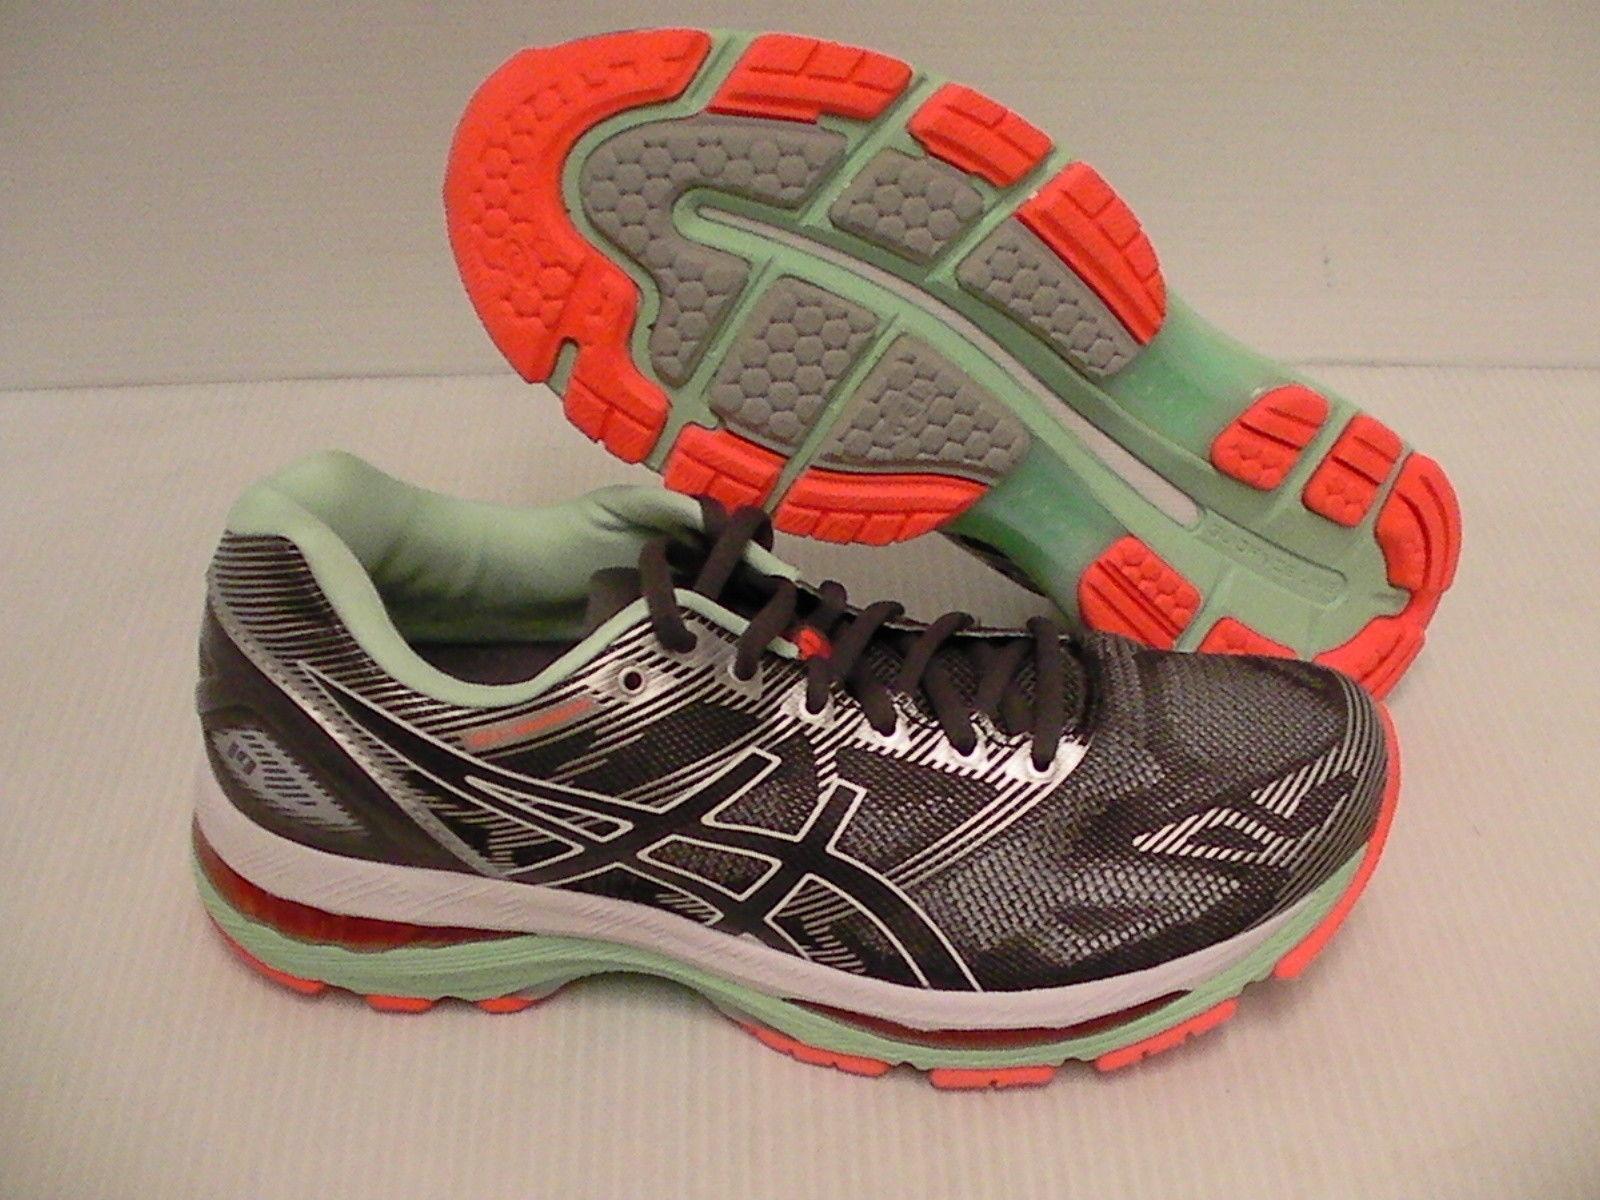 huge discount e1456 6d85d Asics women's gel nimbus 19 running shoes and 31 similar items